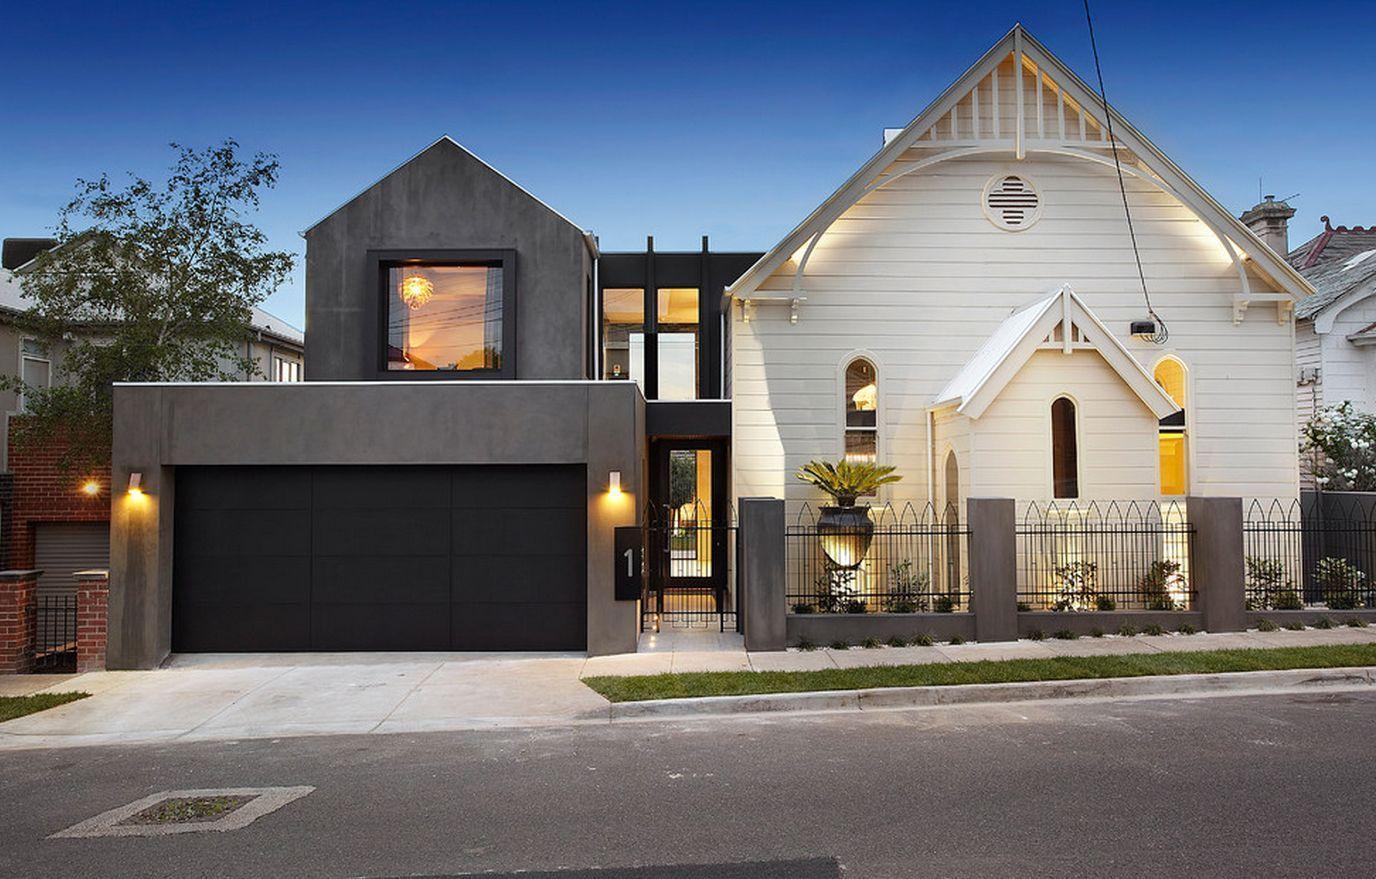 "Foto: Reprodução / <a href=""http://www.houzz.com/projects/125626/residential-church-conversion"" target=""_blank"">Bagnato Architects</a>"